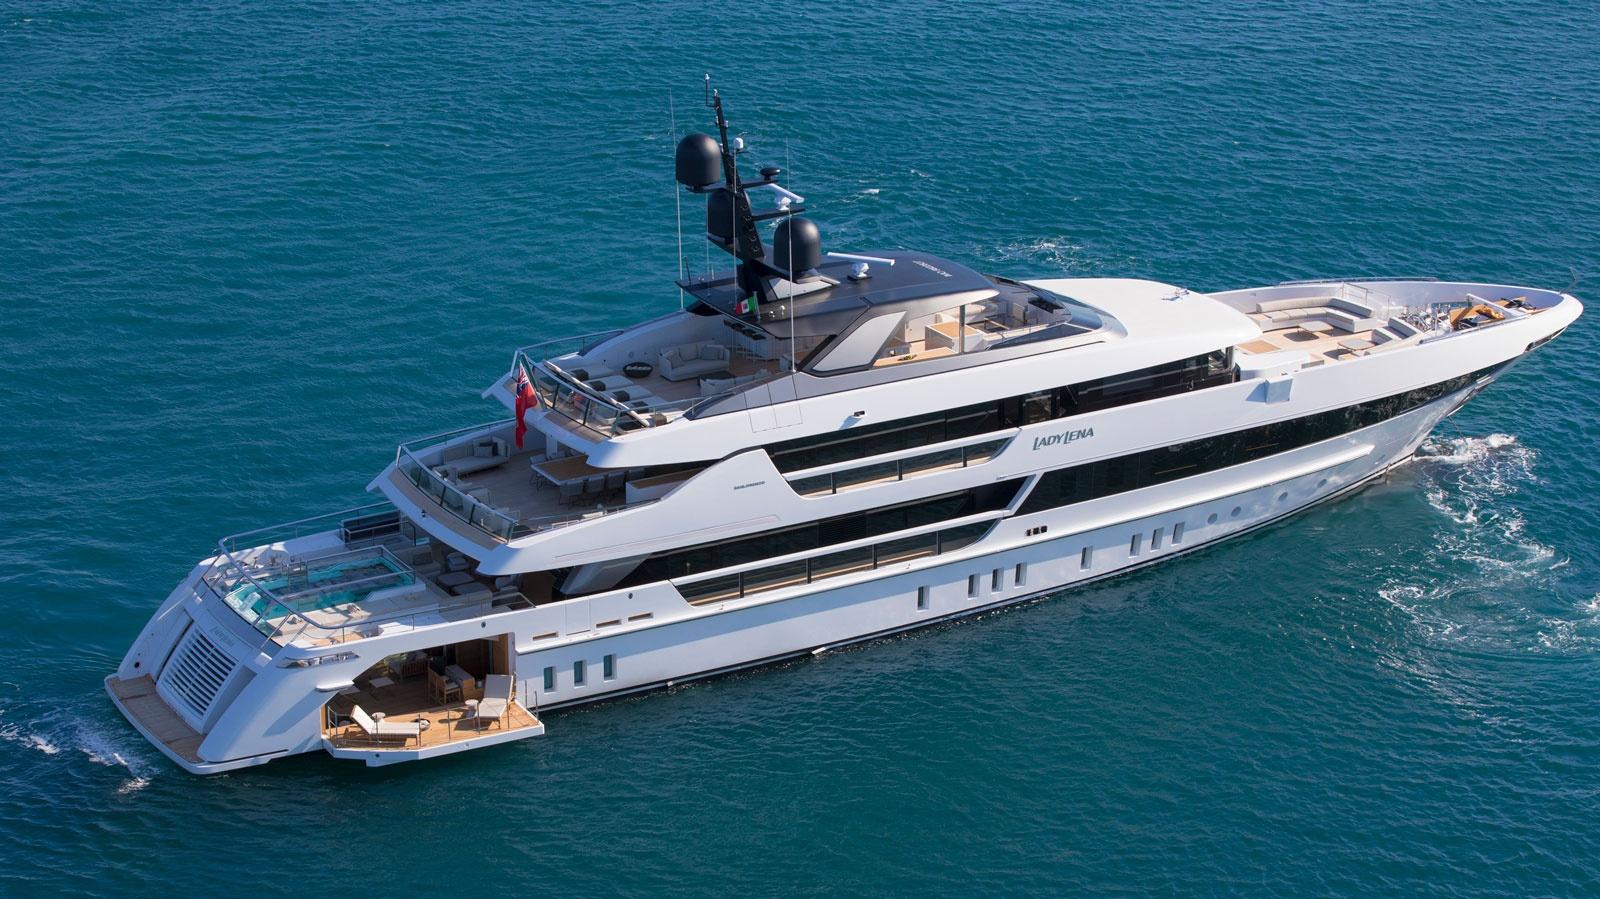 Sanlorenzo Yacht 52 Steel Lady Lena - boat shopping